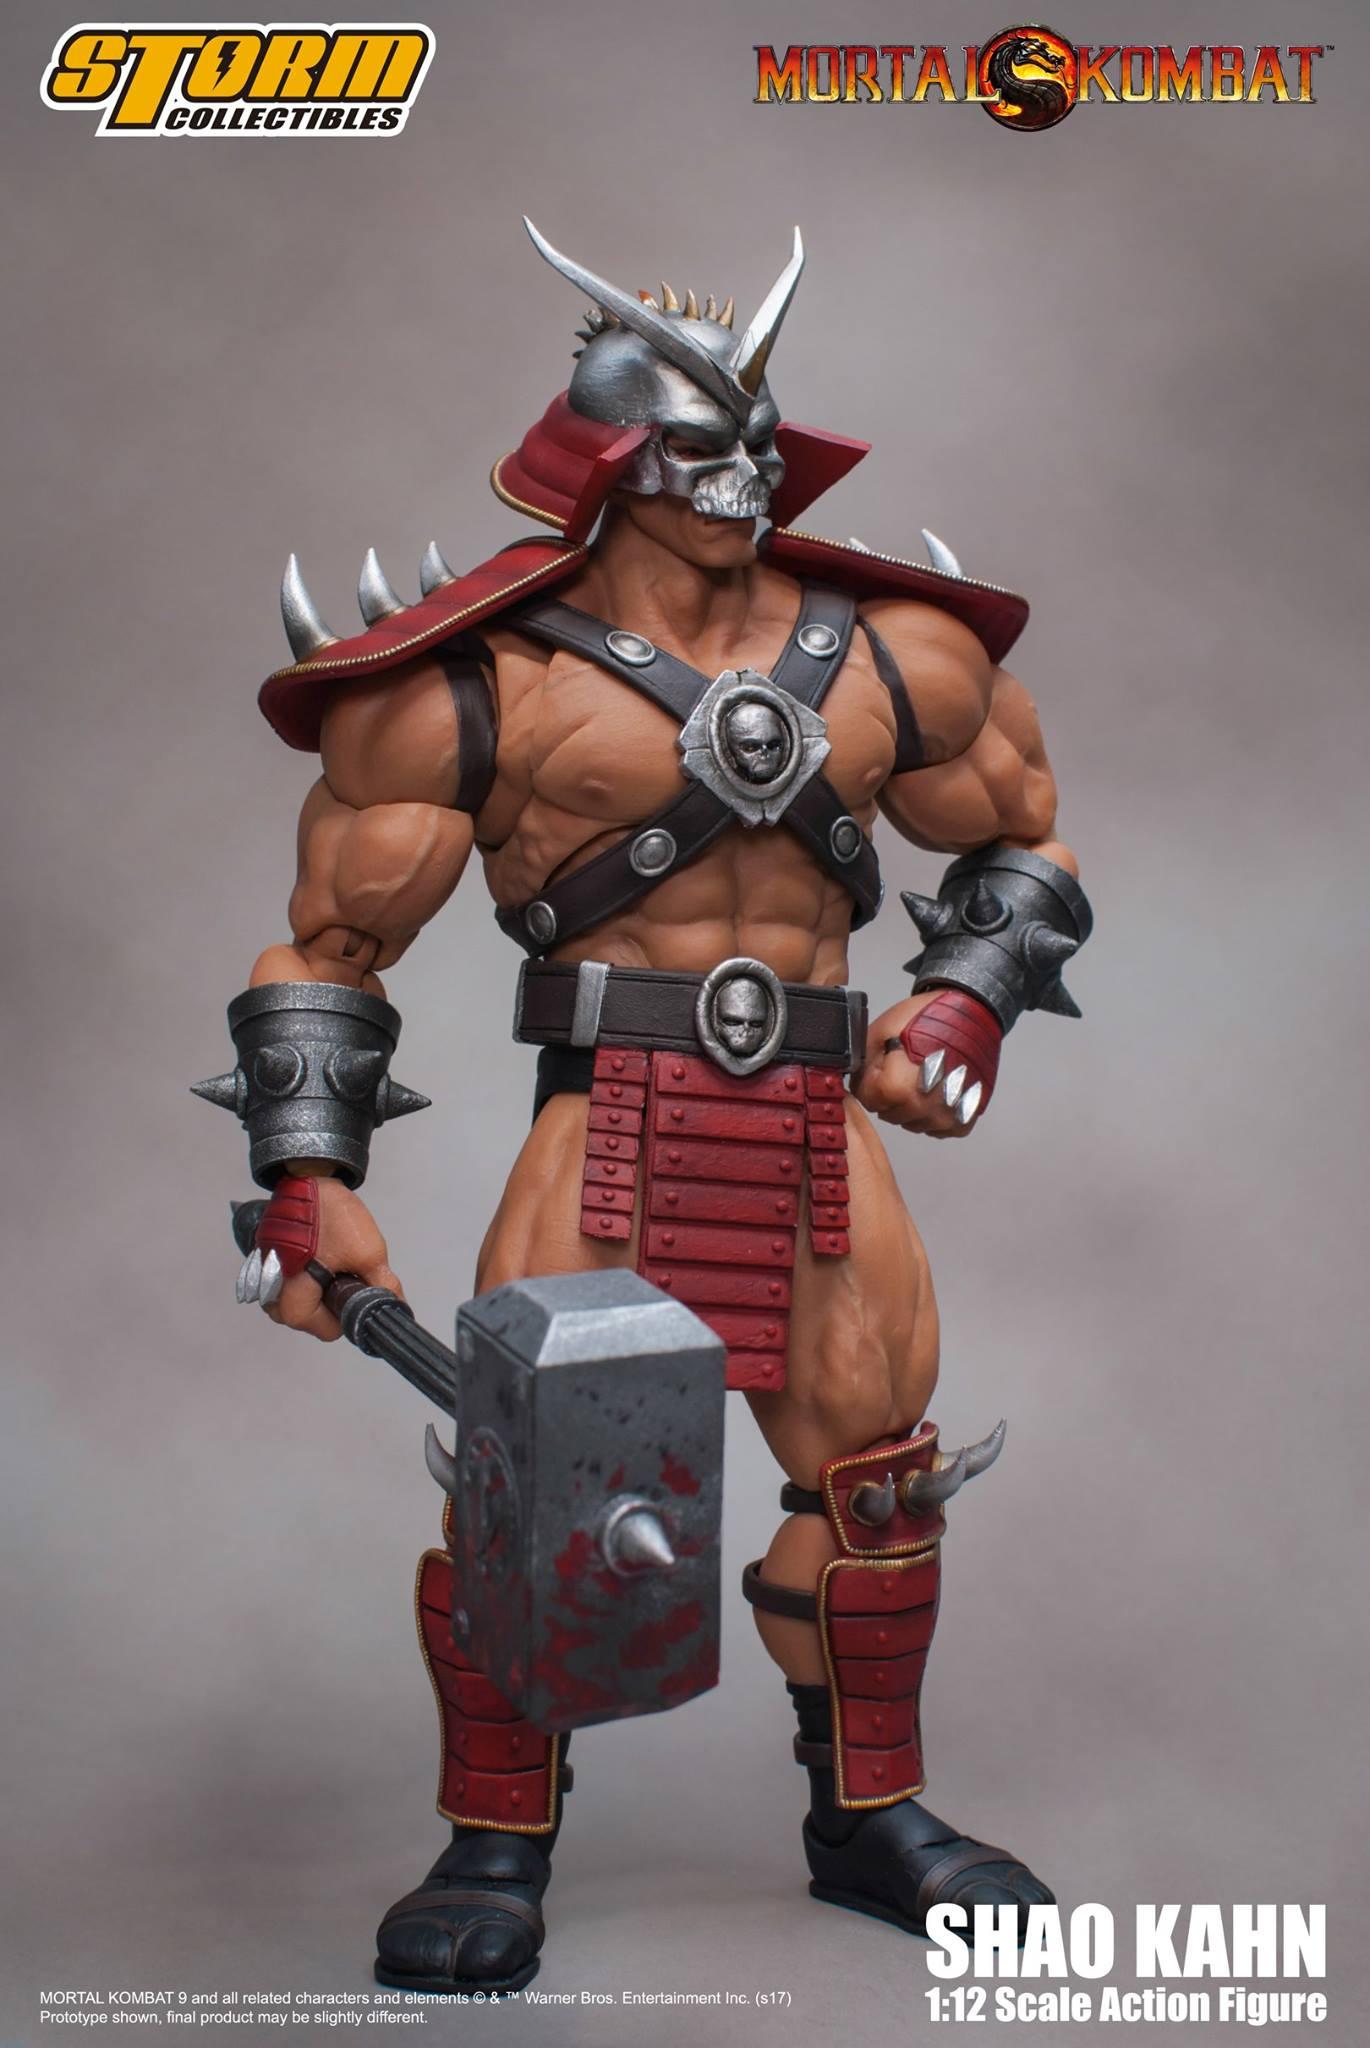 Storm-Mortal-Kombat-Shao-Kahn-006